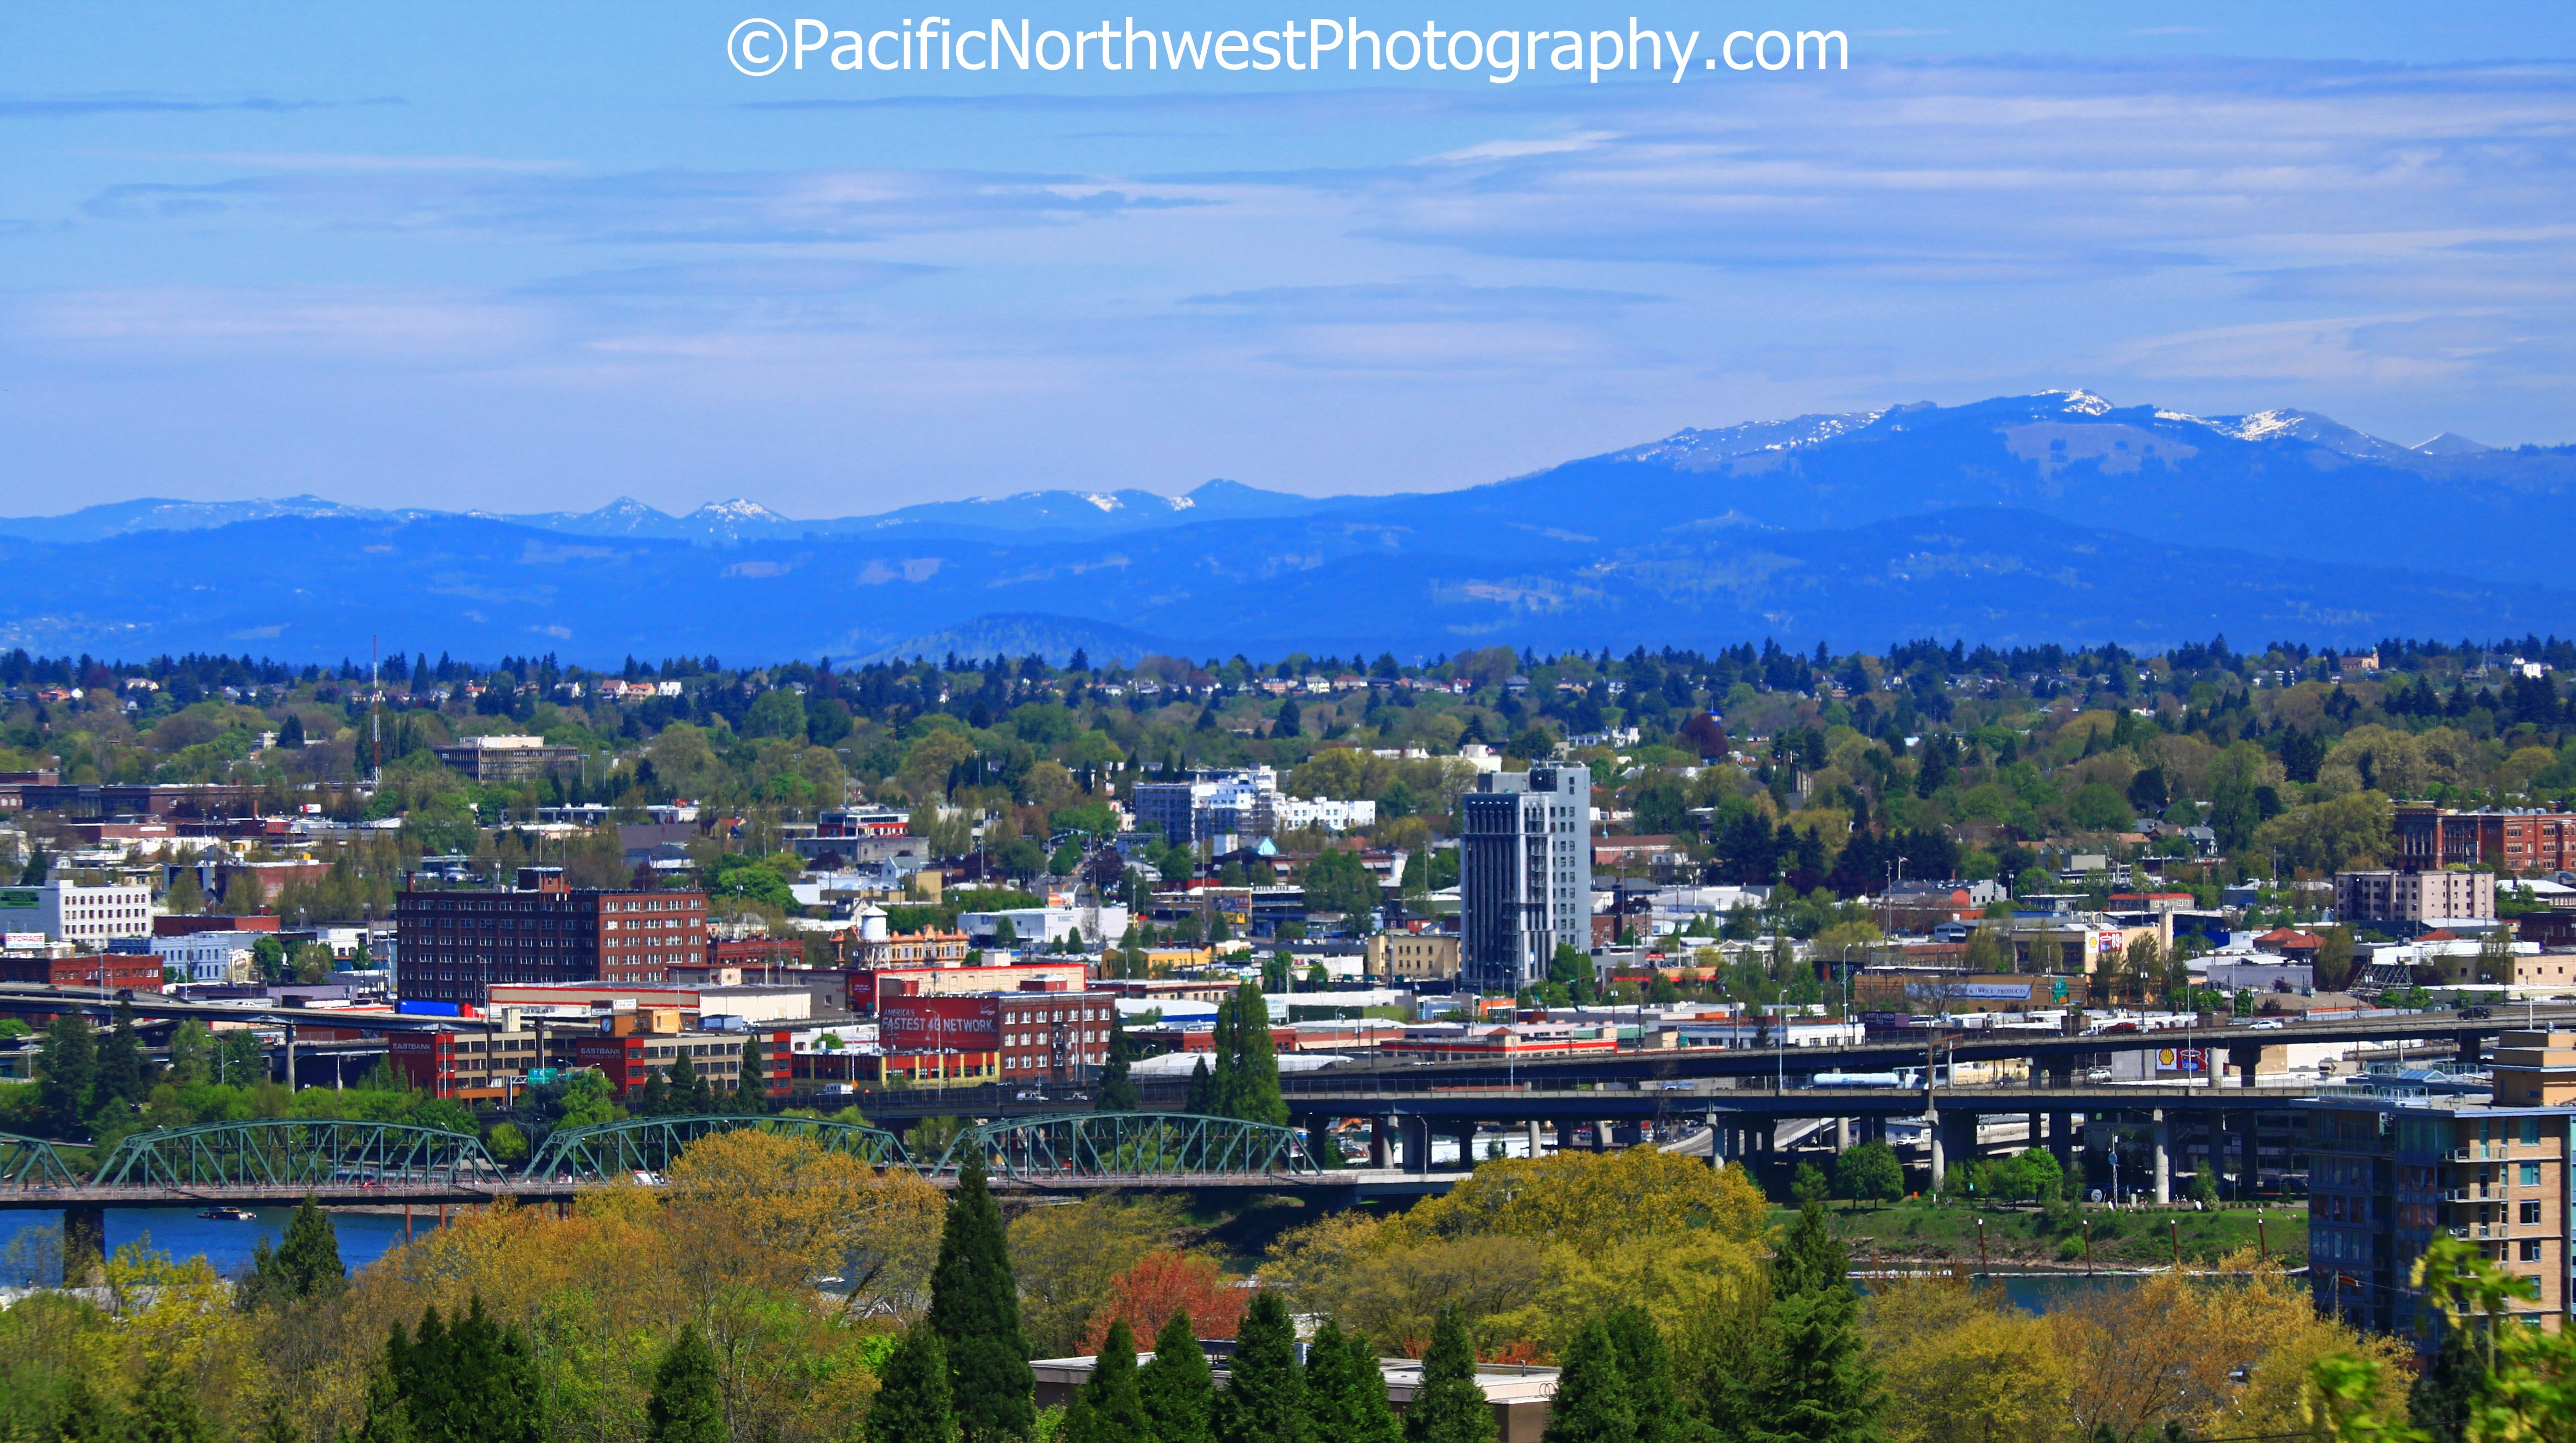 A unique view of Portland, Oregon